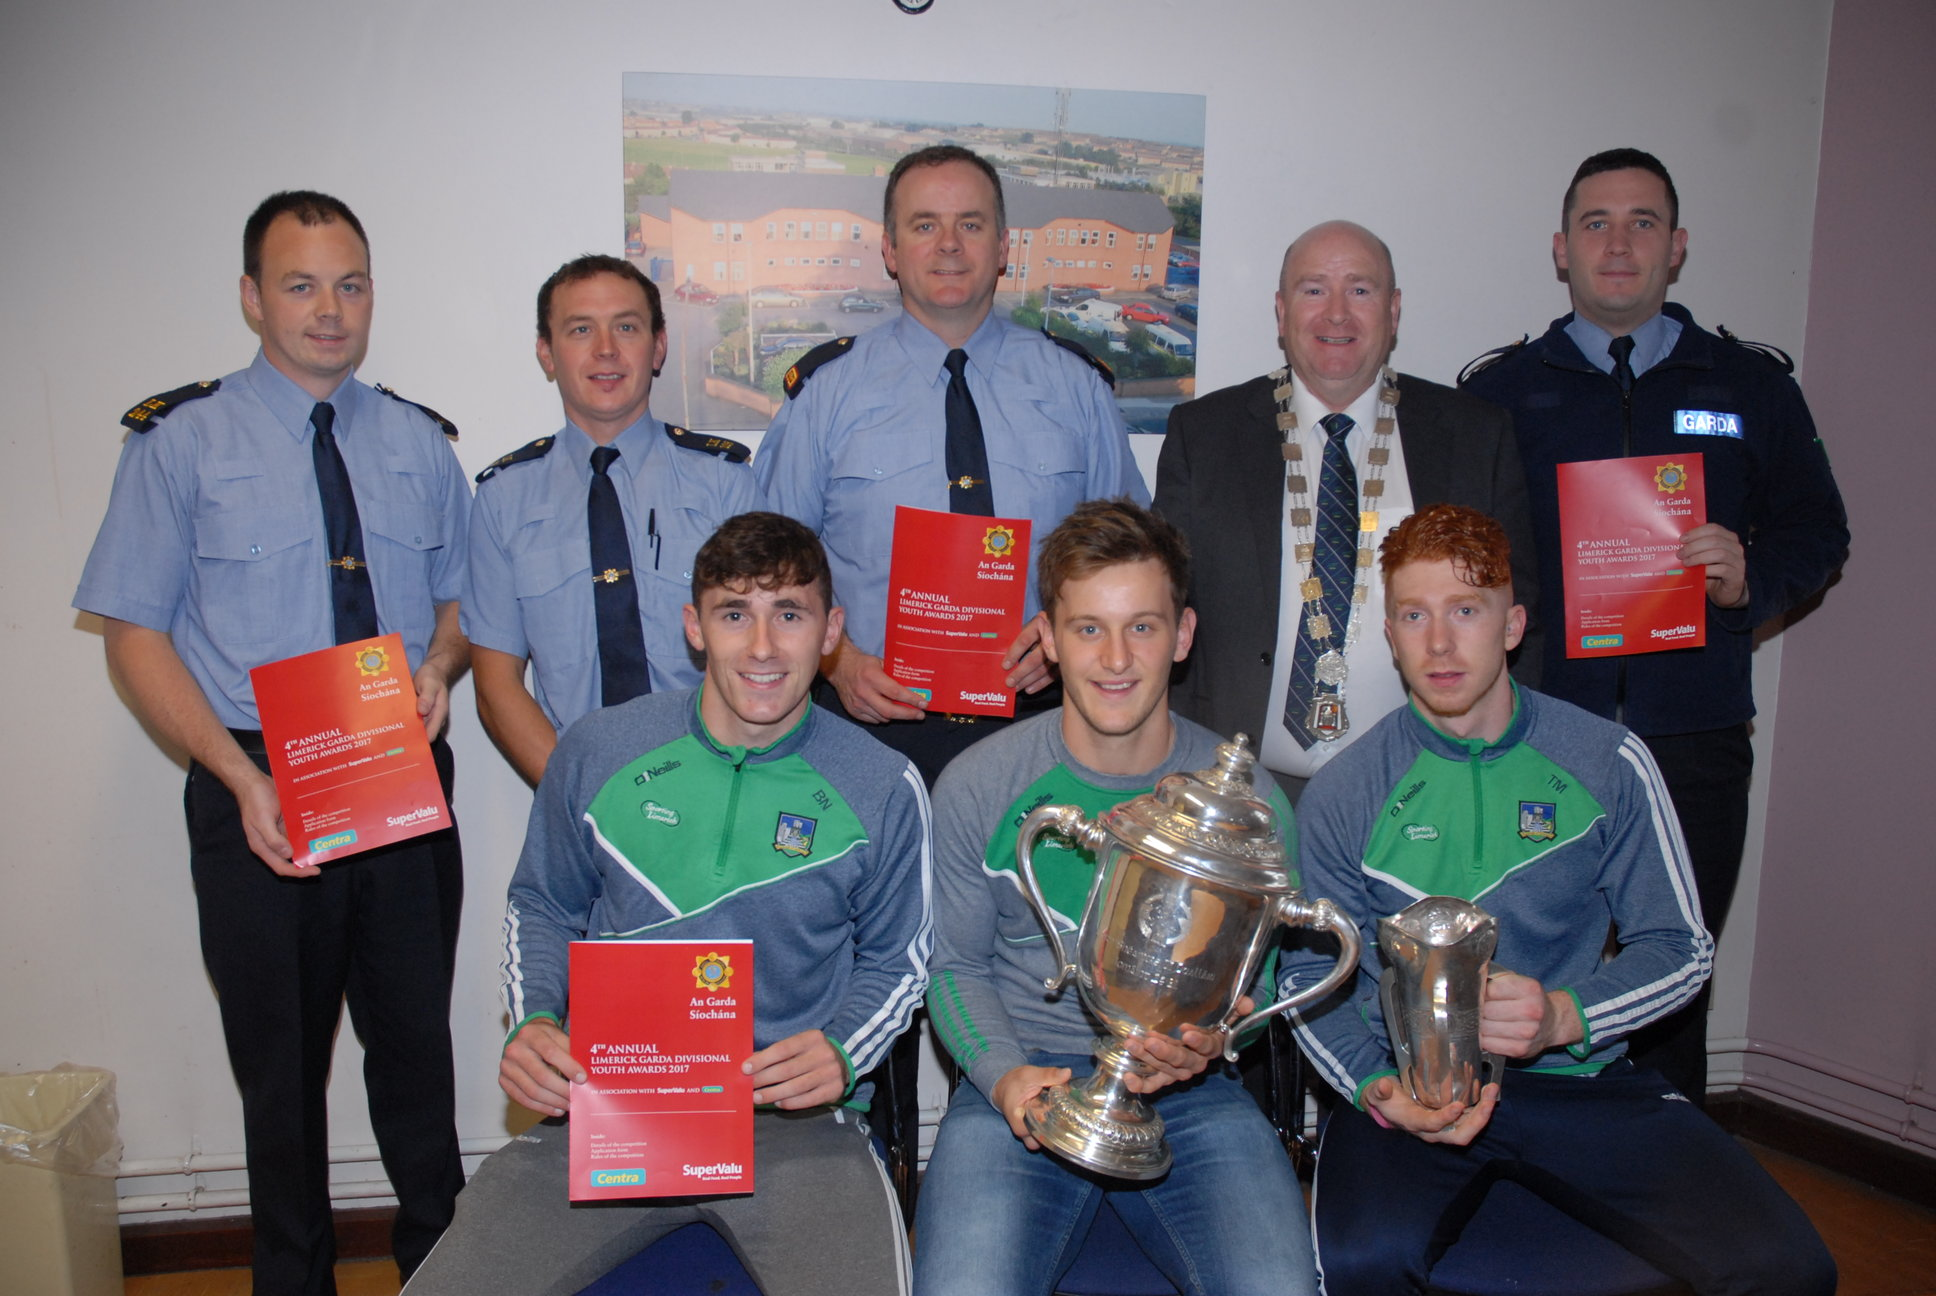 Limerick Garda Divisional Youth Awards 2017